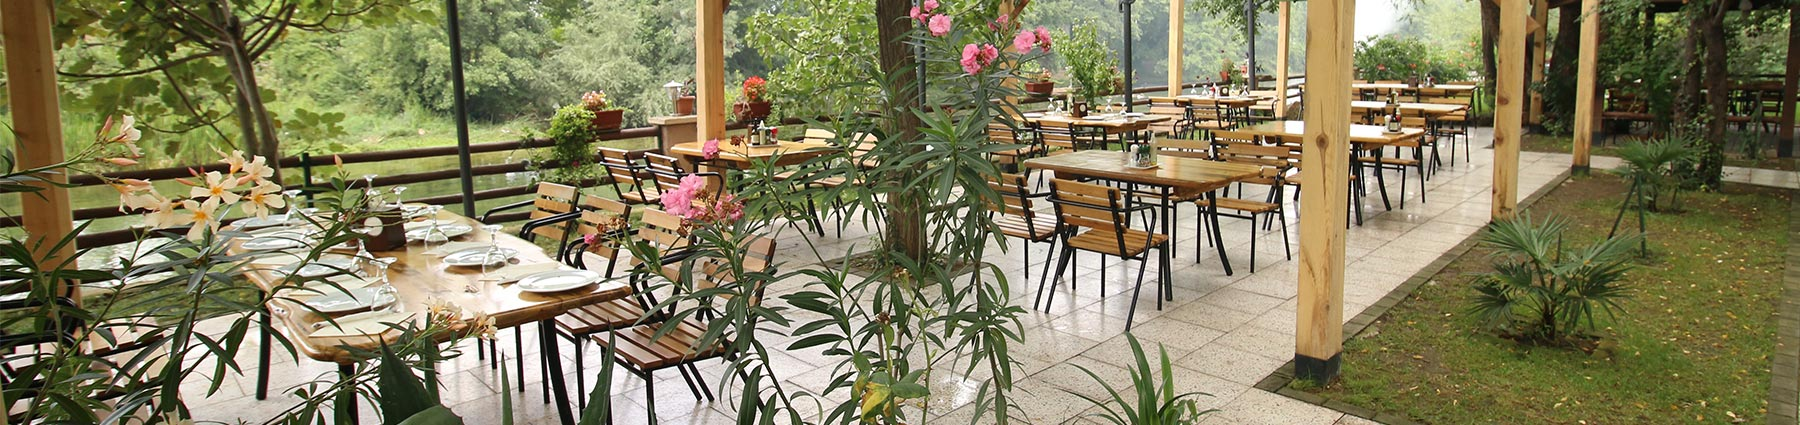 Restaurant Riverside Garden